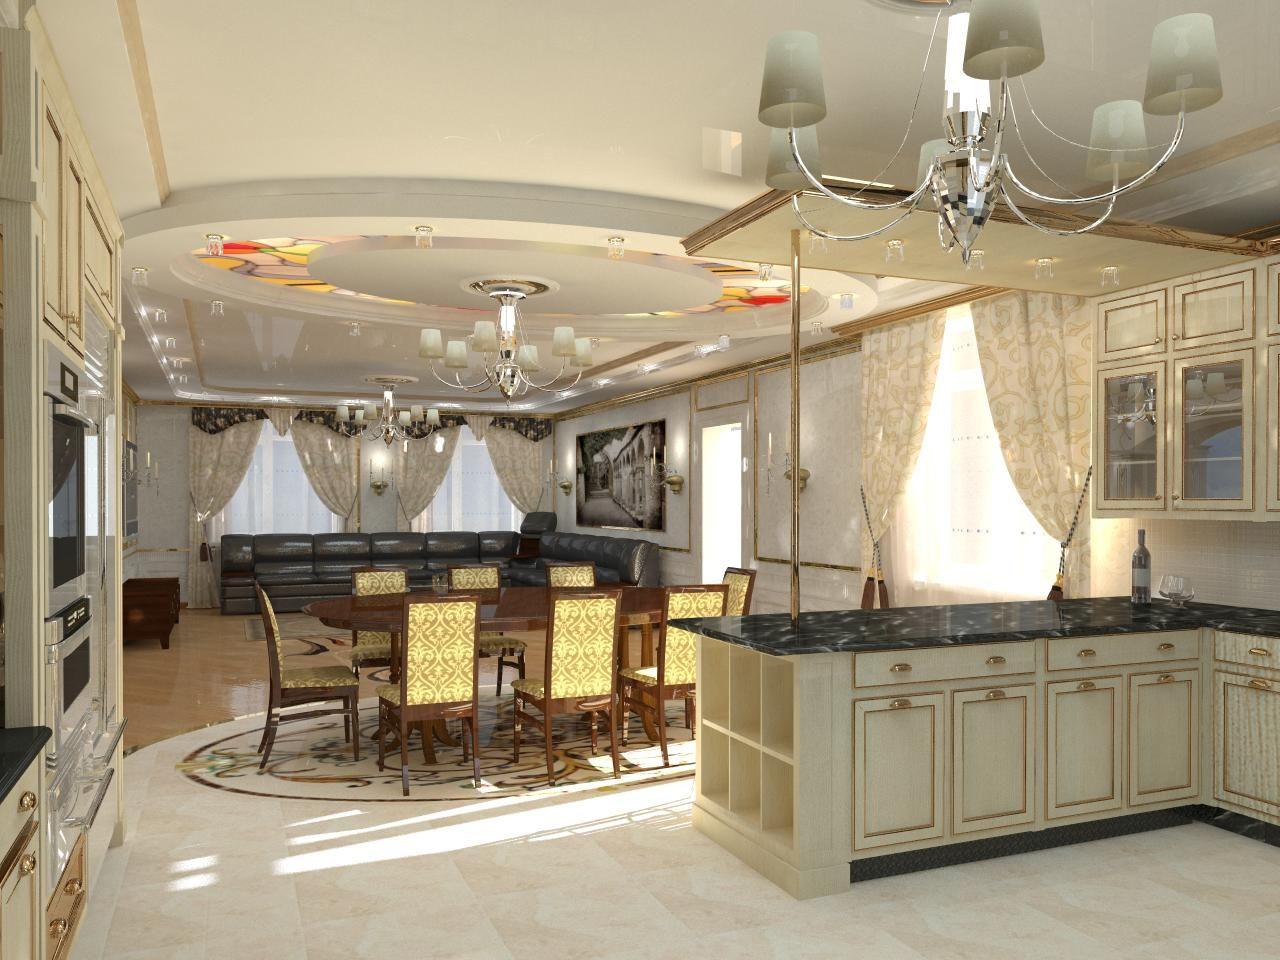 Кухня-столовая | Интерьер кухни, Интерьер, Расстановка мебели